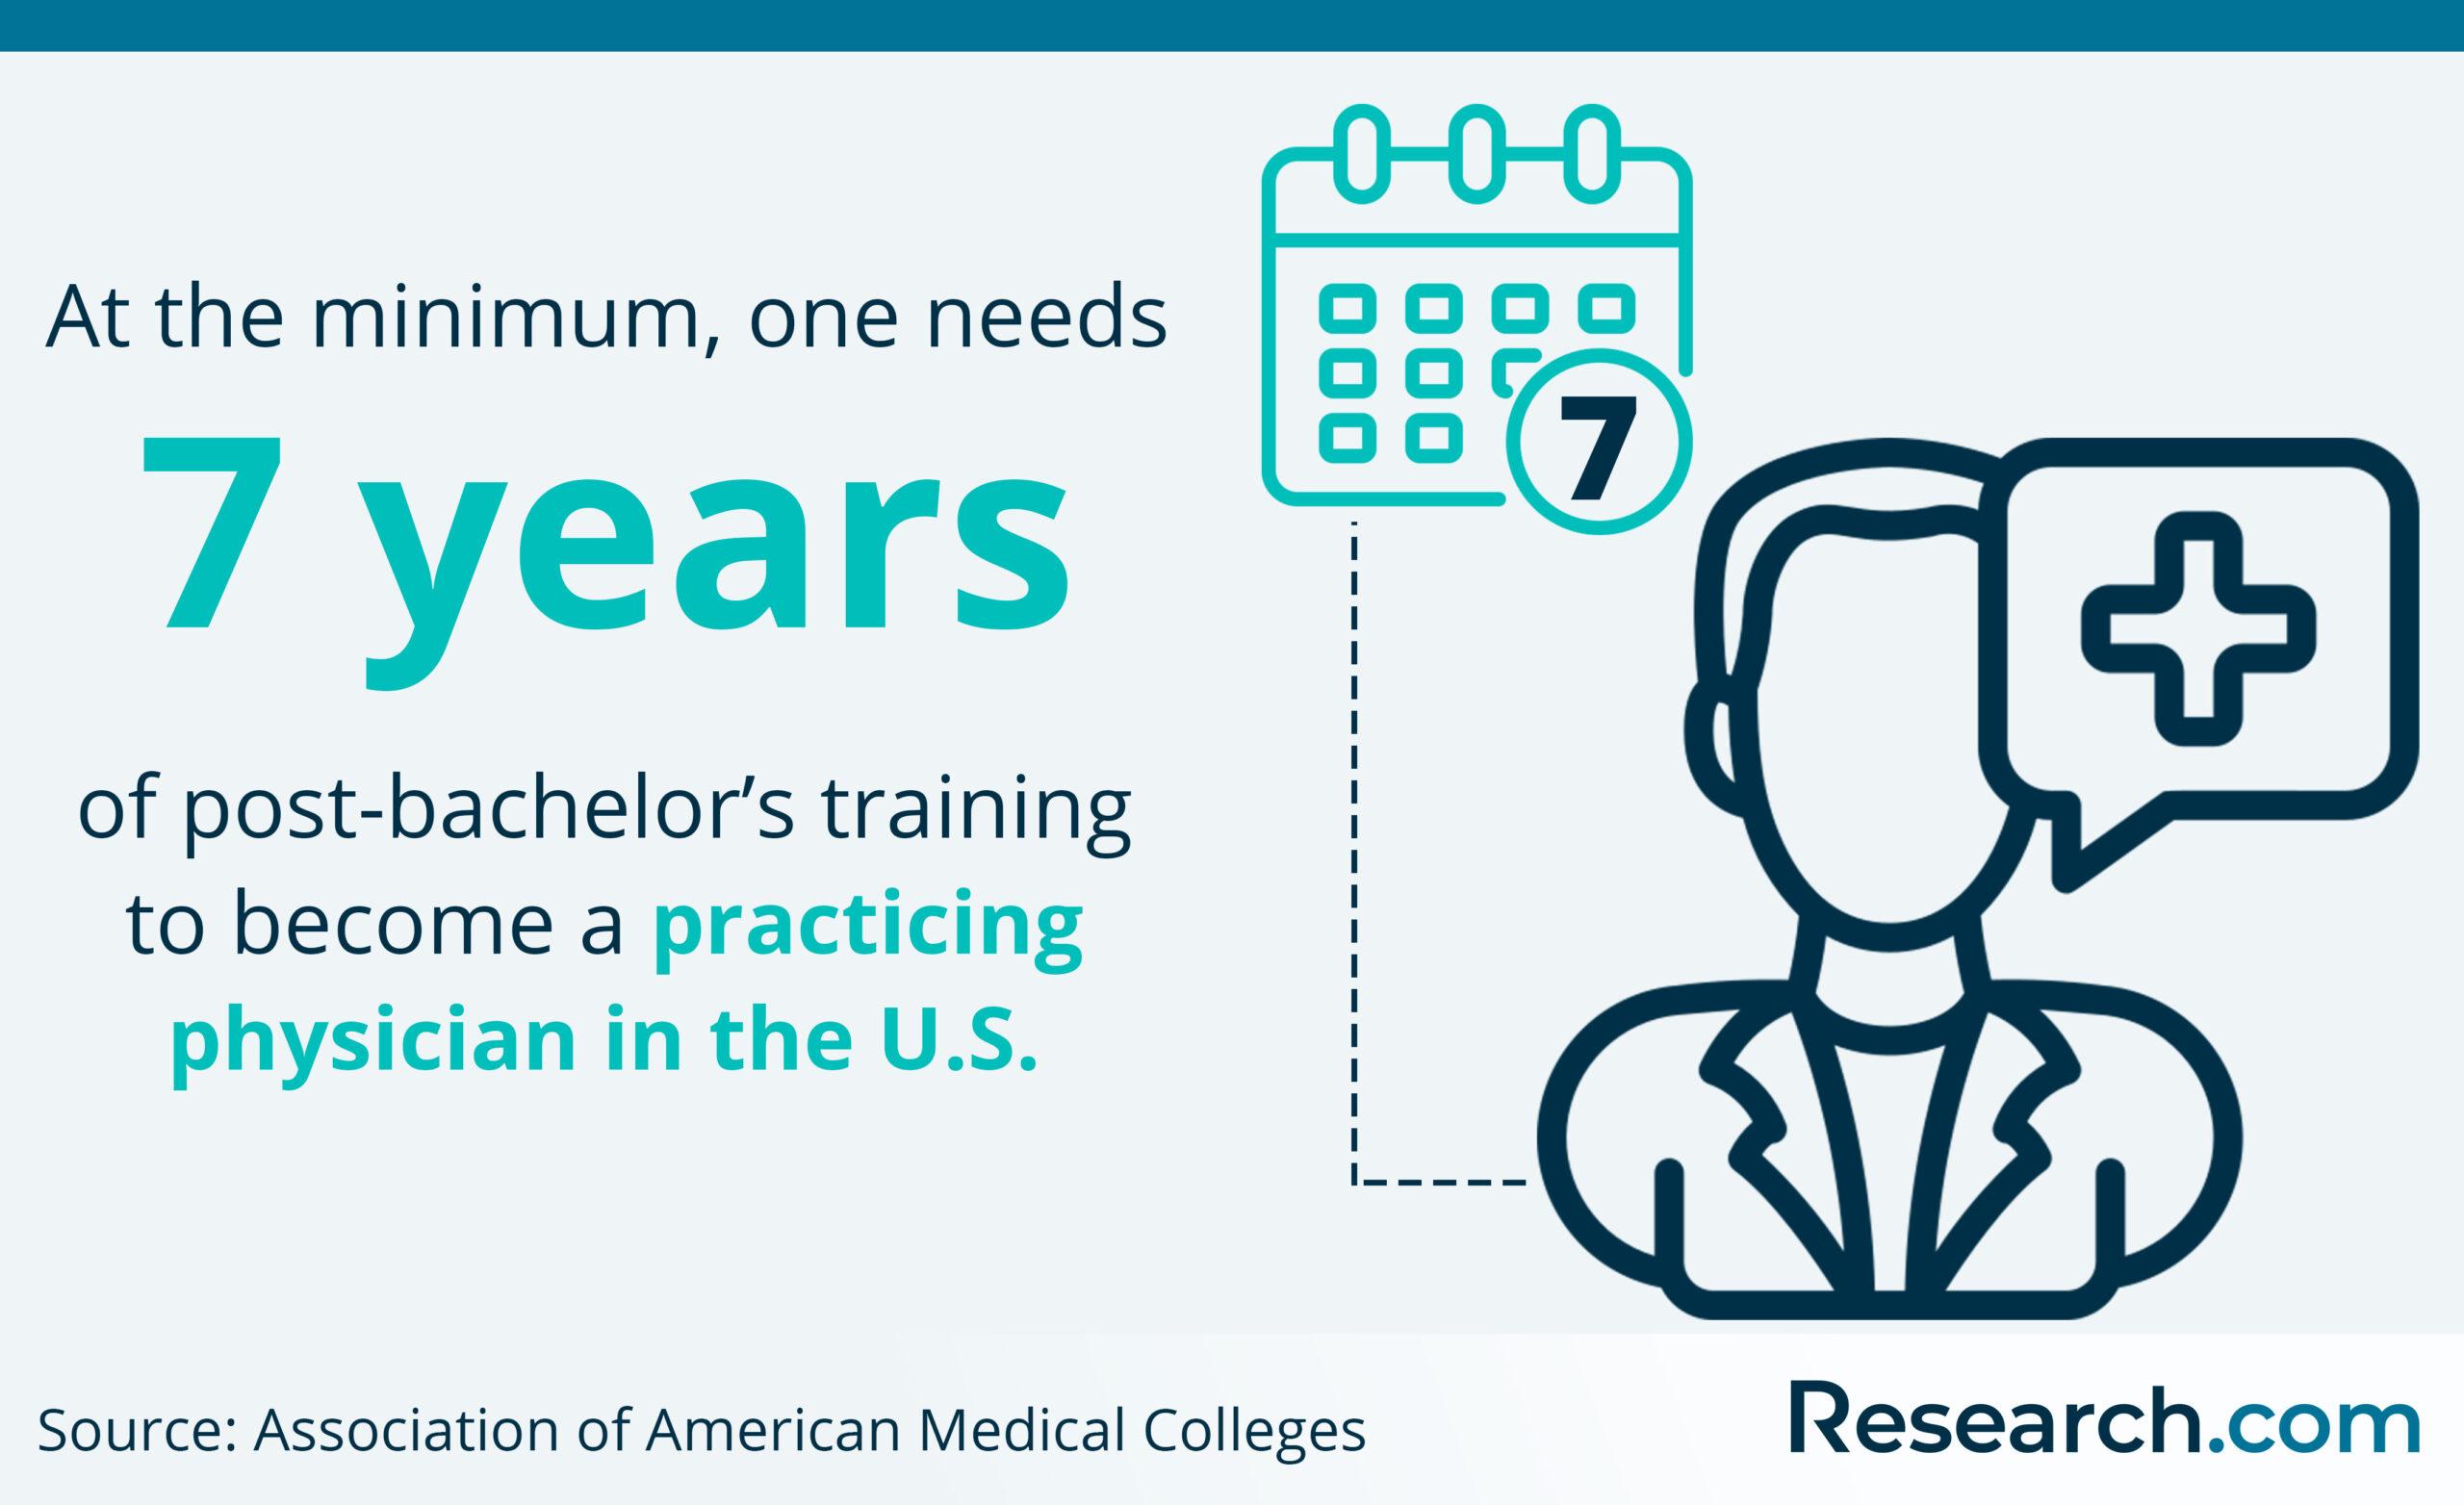 minimum post-bachelor's training to practice medicine in the U.S.